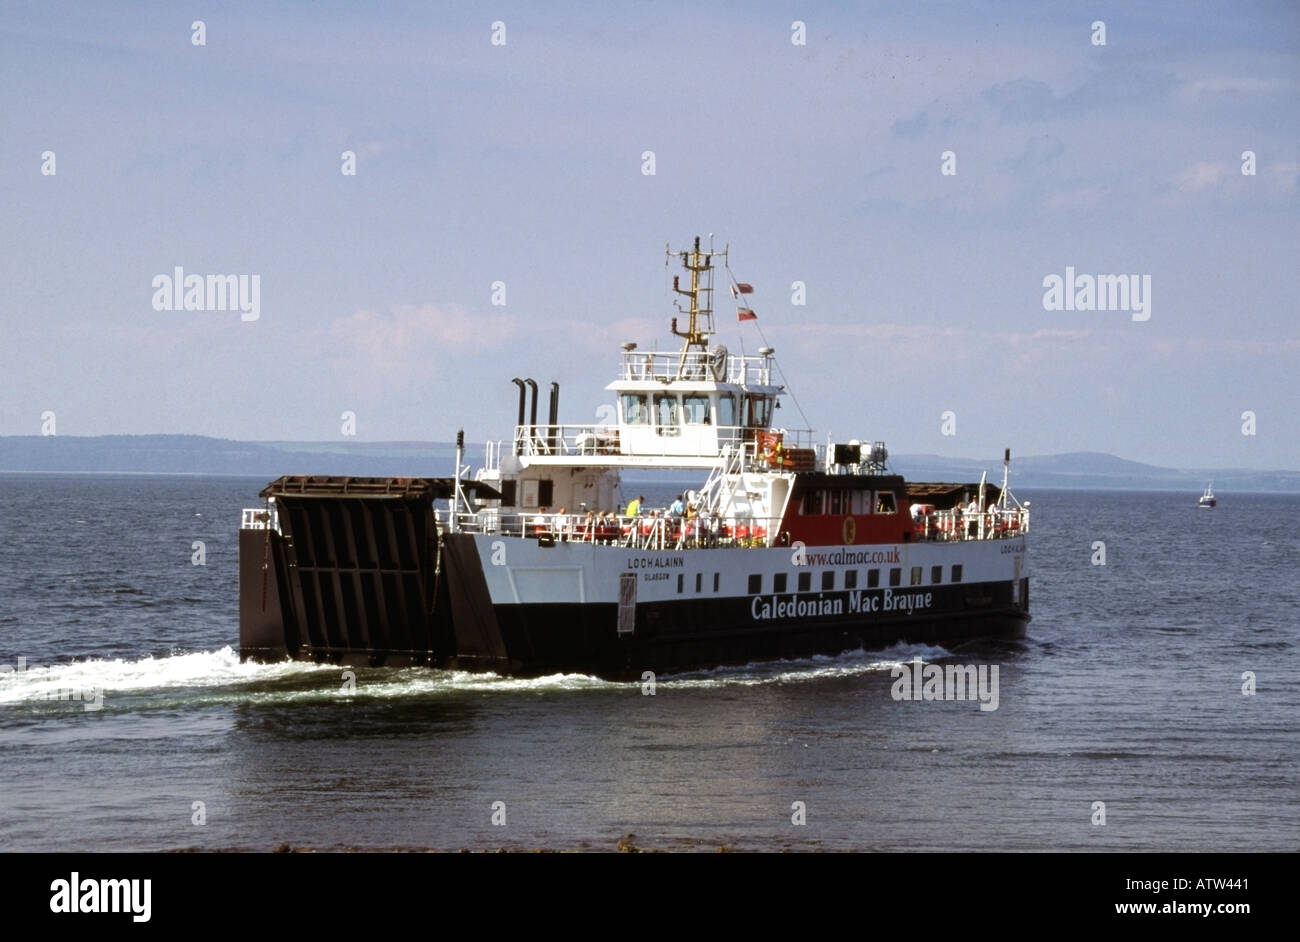 Cal Mac Ferry Loch Alainn leaving Largs for Millport on Great Cumbrae island Clyde Estuary Scotland - Stock Image